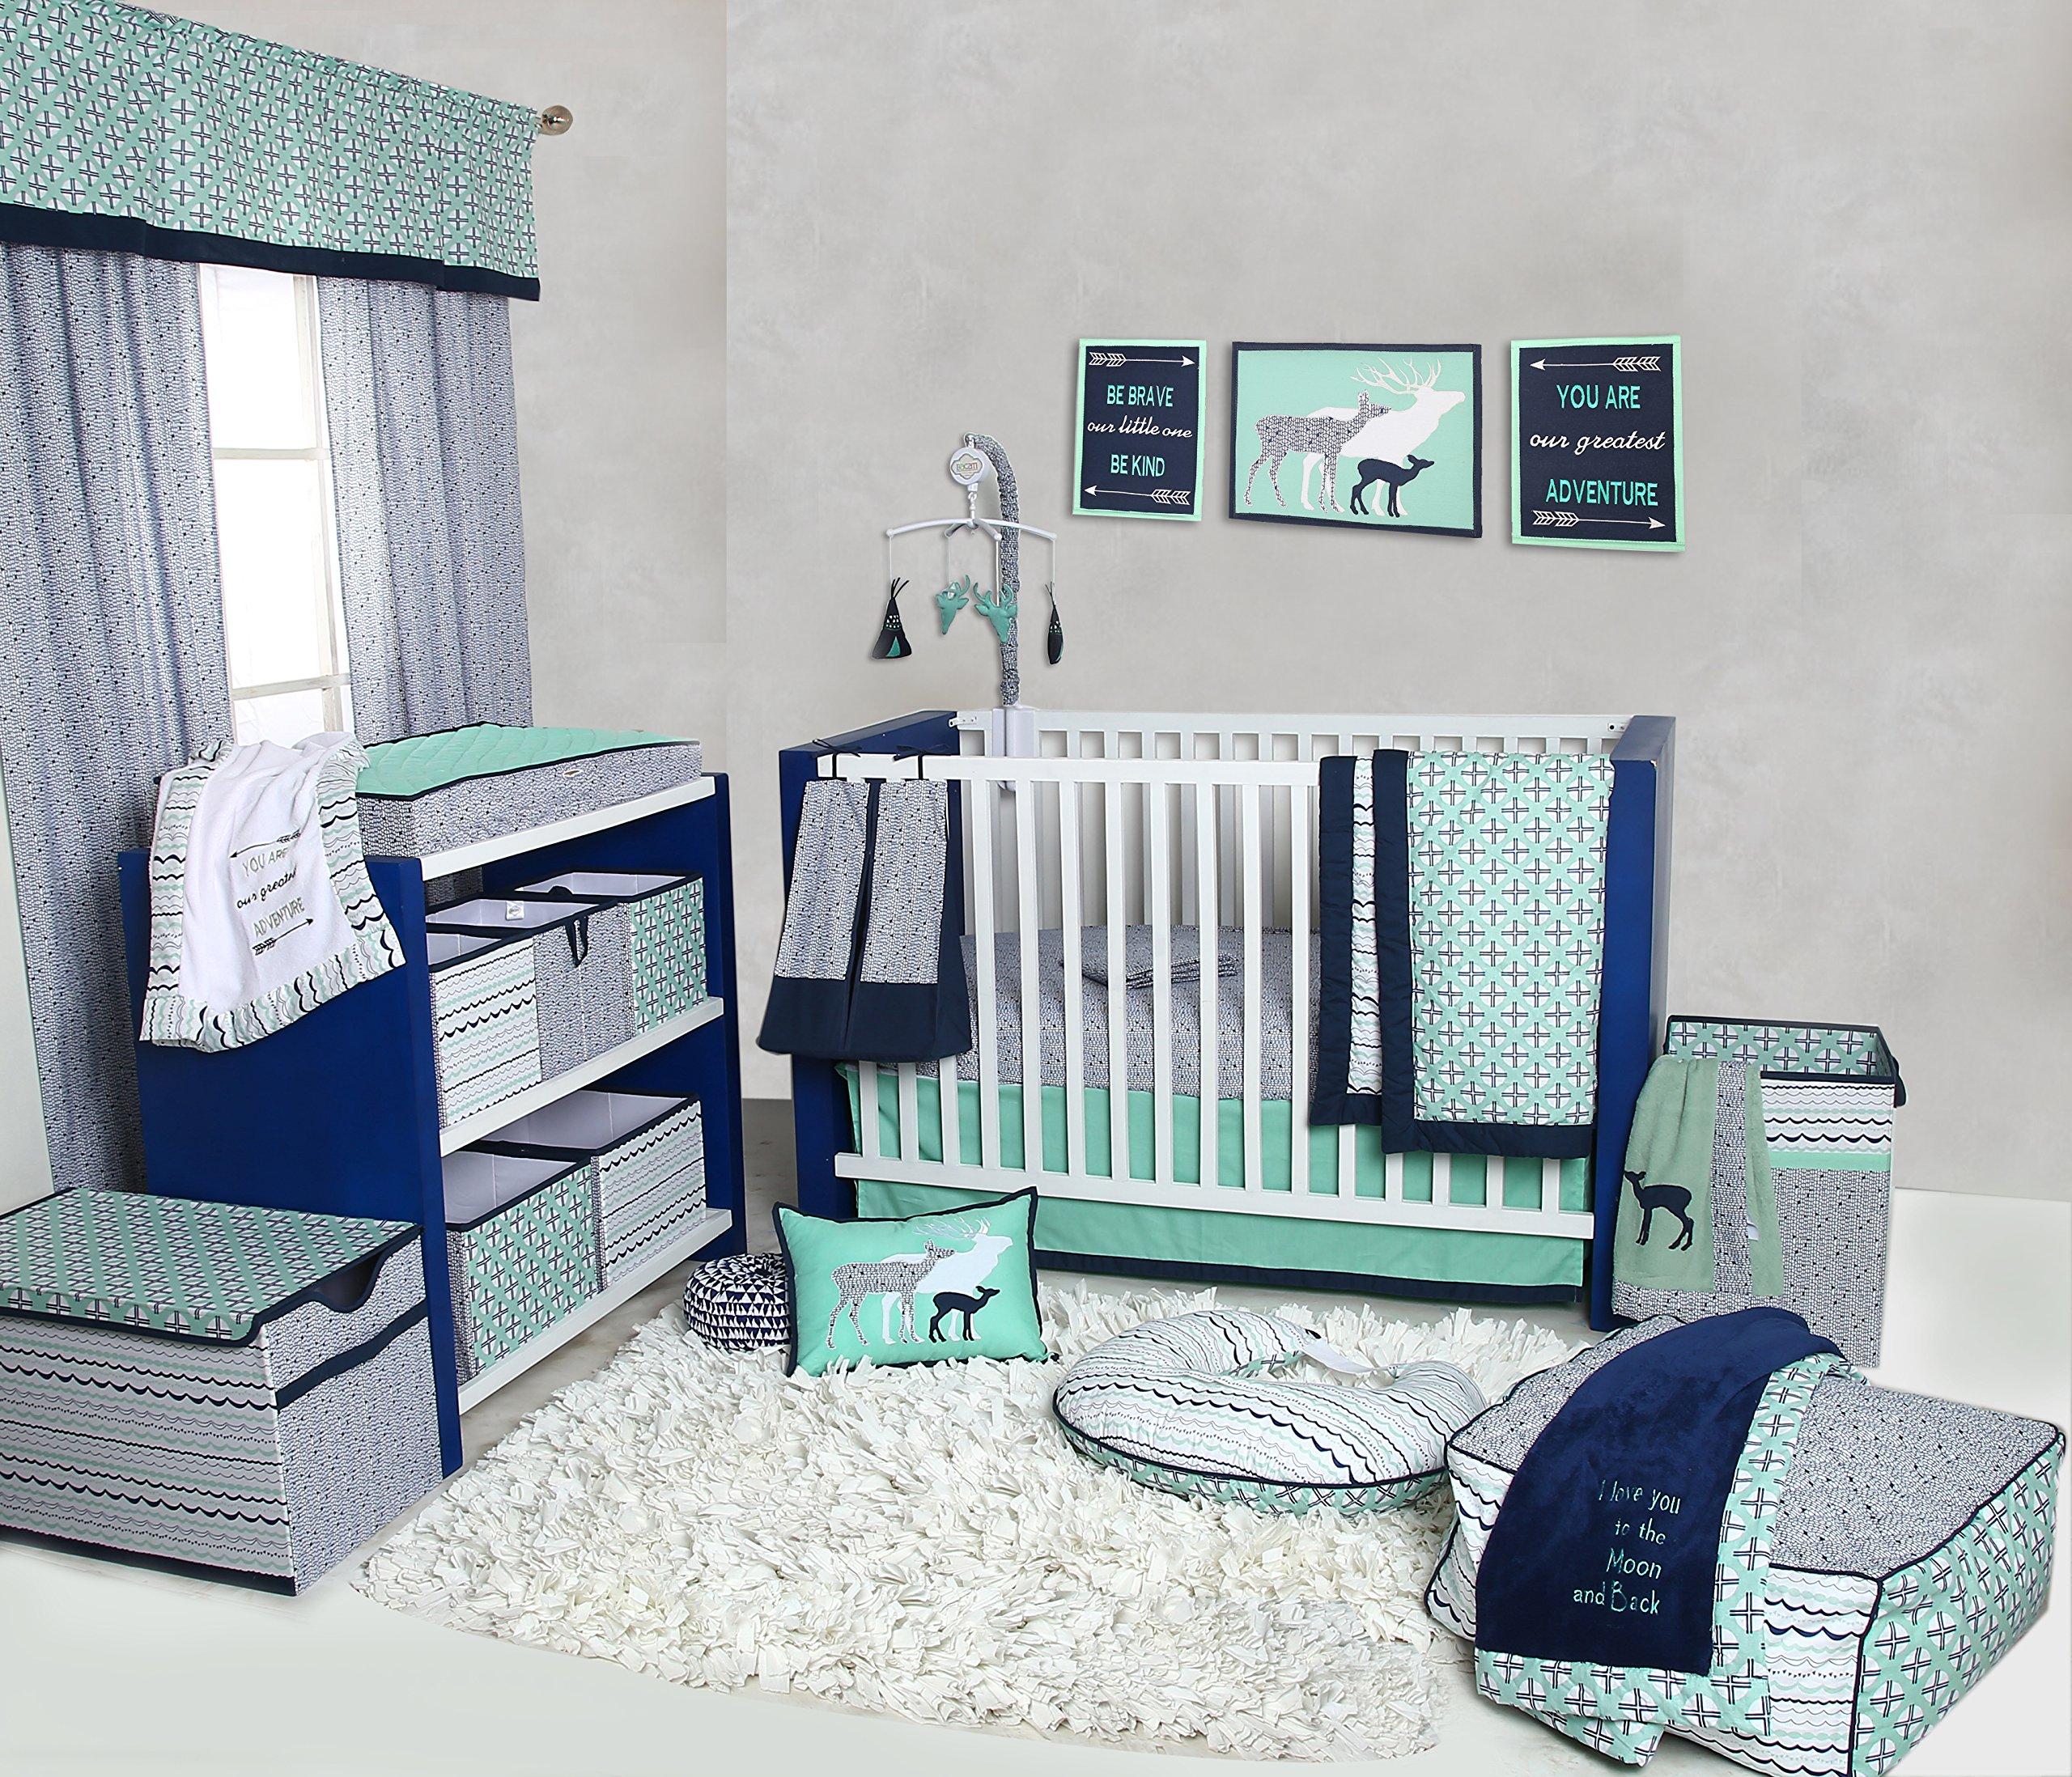 Bacati Noah Tribal 10 Piece Nursery-in-a-Bag Cotton Percale Unisex Crib Bedding Set, Mint/Navy